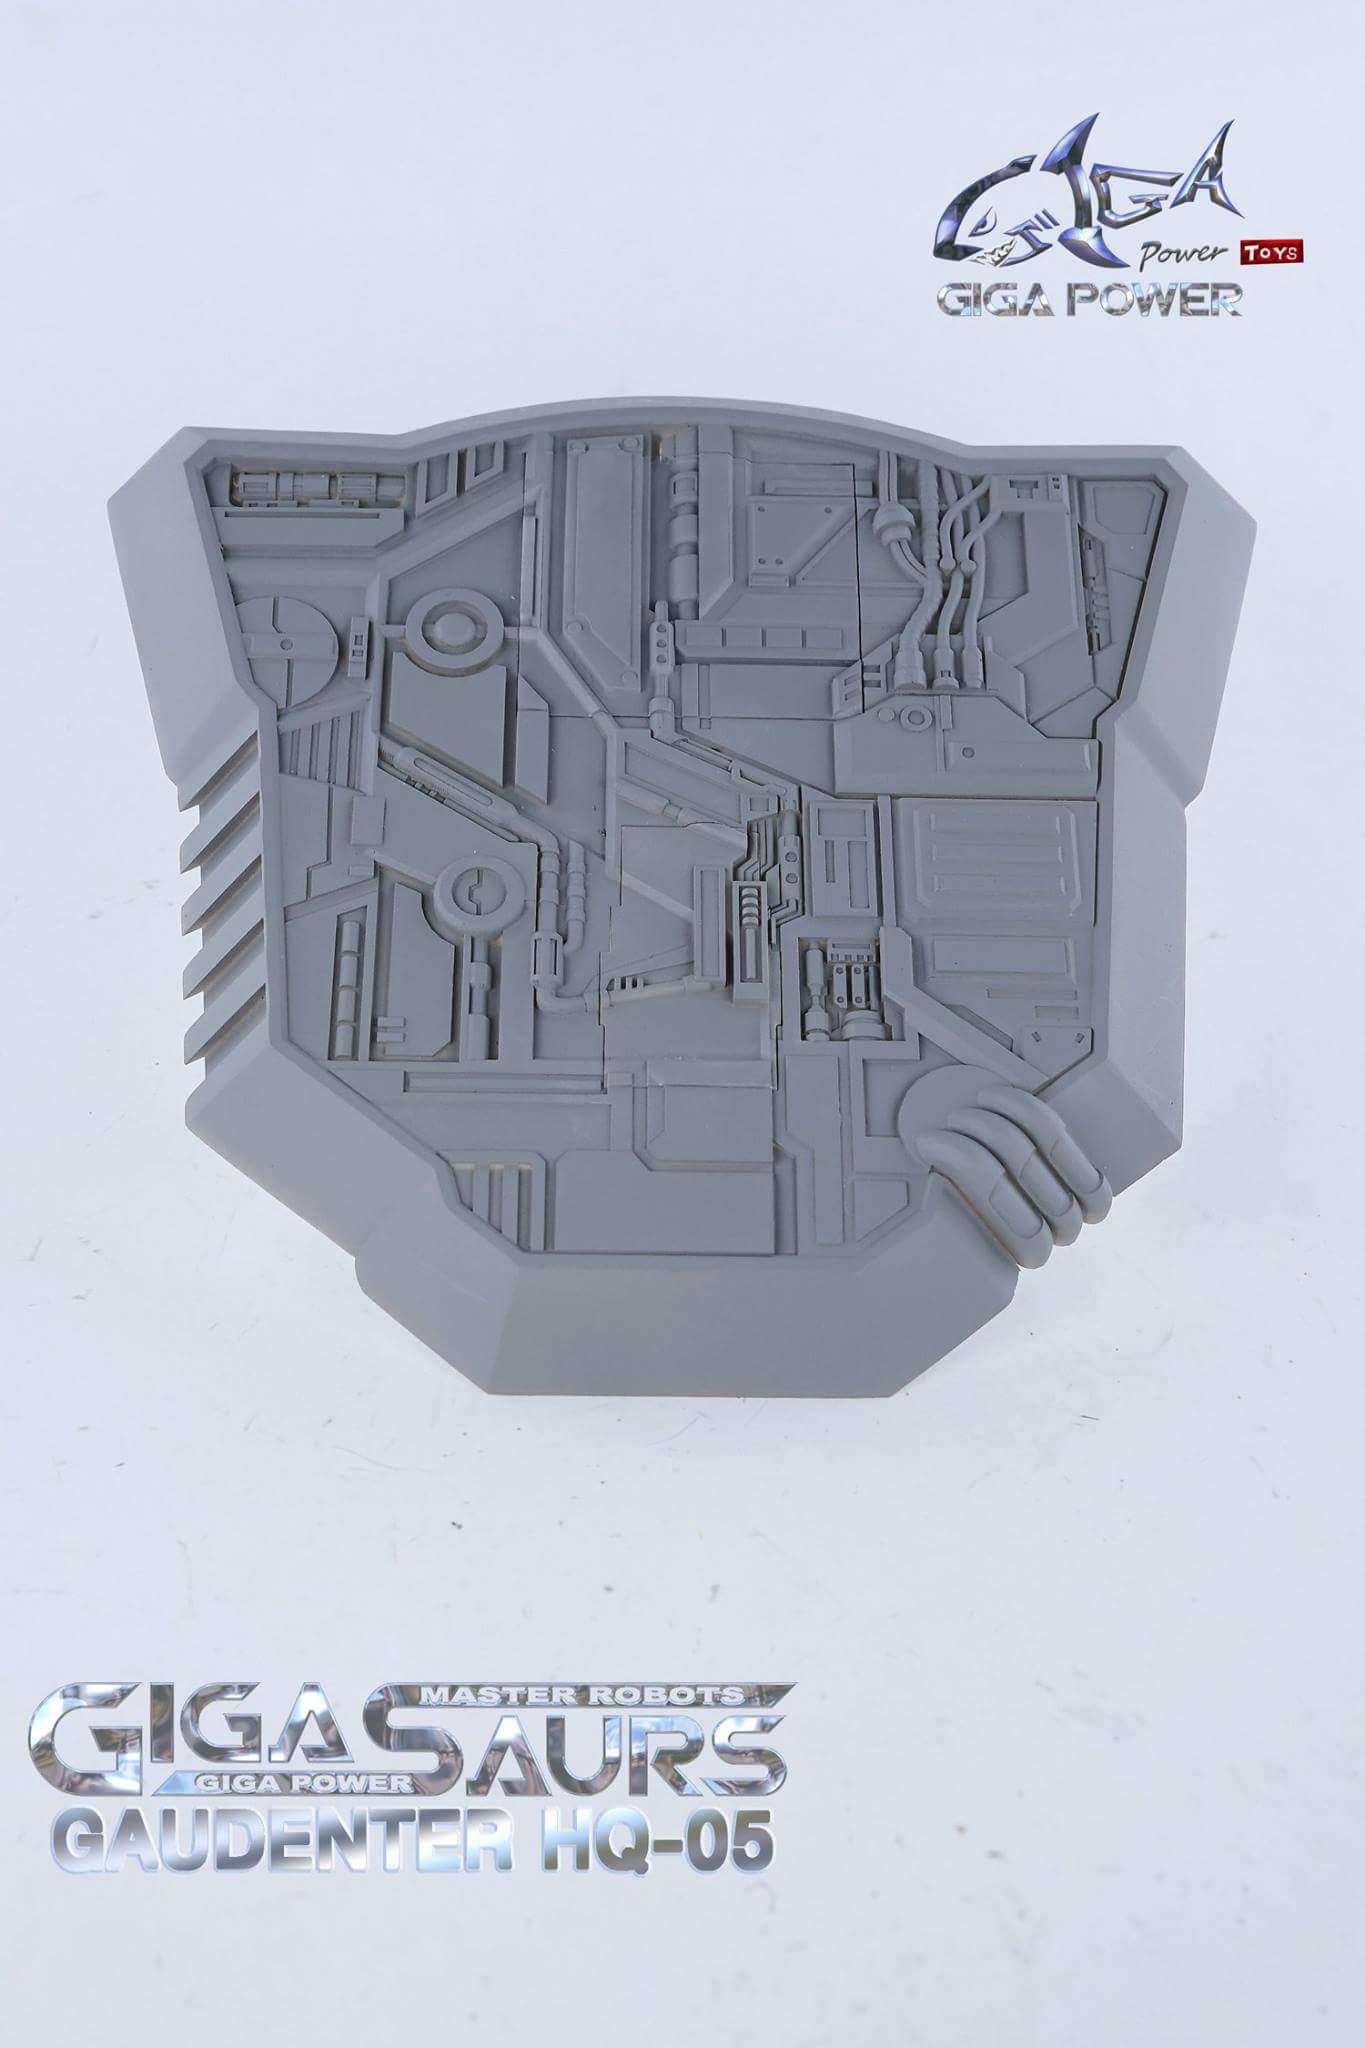 [GigaPower] Produit Tiers - Jouets HQ-01 Superator + HQ-02 Grassor + HQ-03 Guttur + HQ-04 Graviter + HQ-05 Gaudenter - aka Dinobots - Page 4 BvIUoz2p